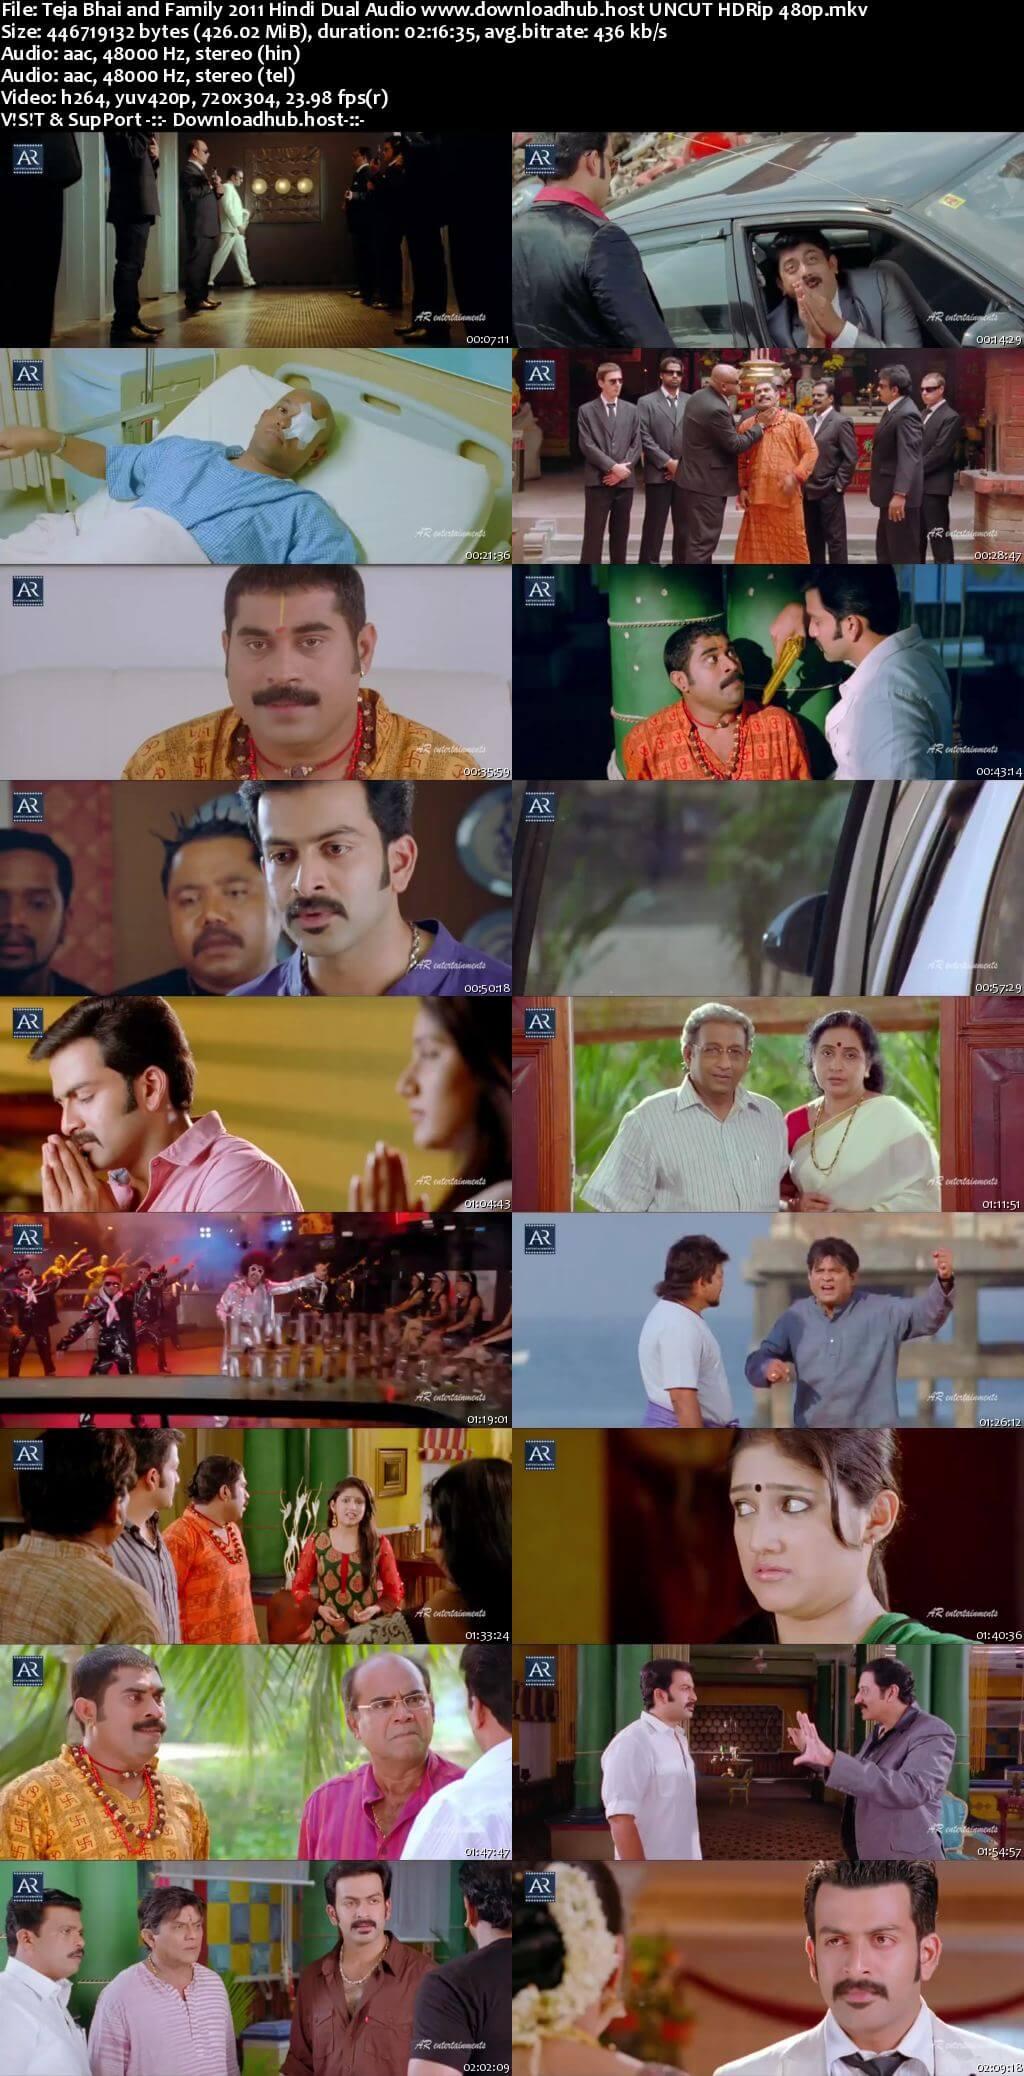 Teja Bhai and Family 2011 Hindi Dual Audio 400MB UNCUT HDRip 480p